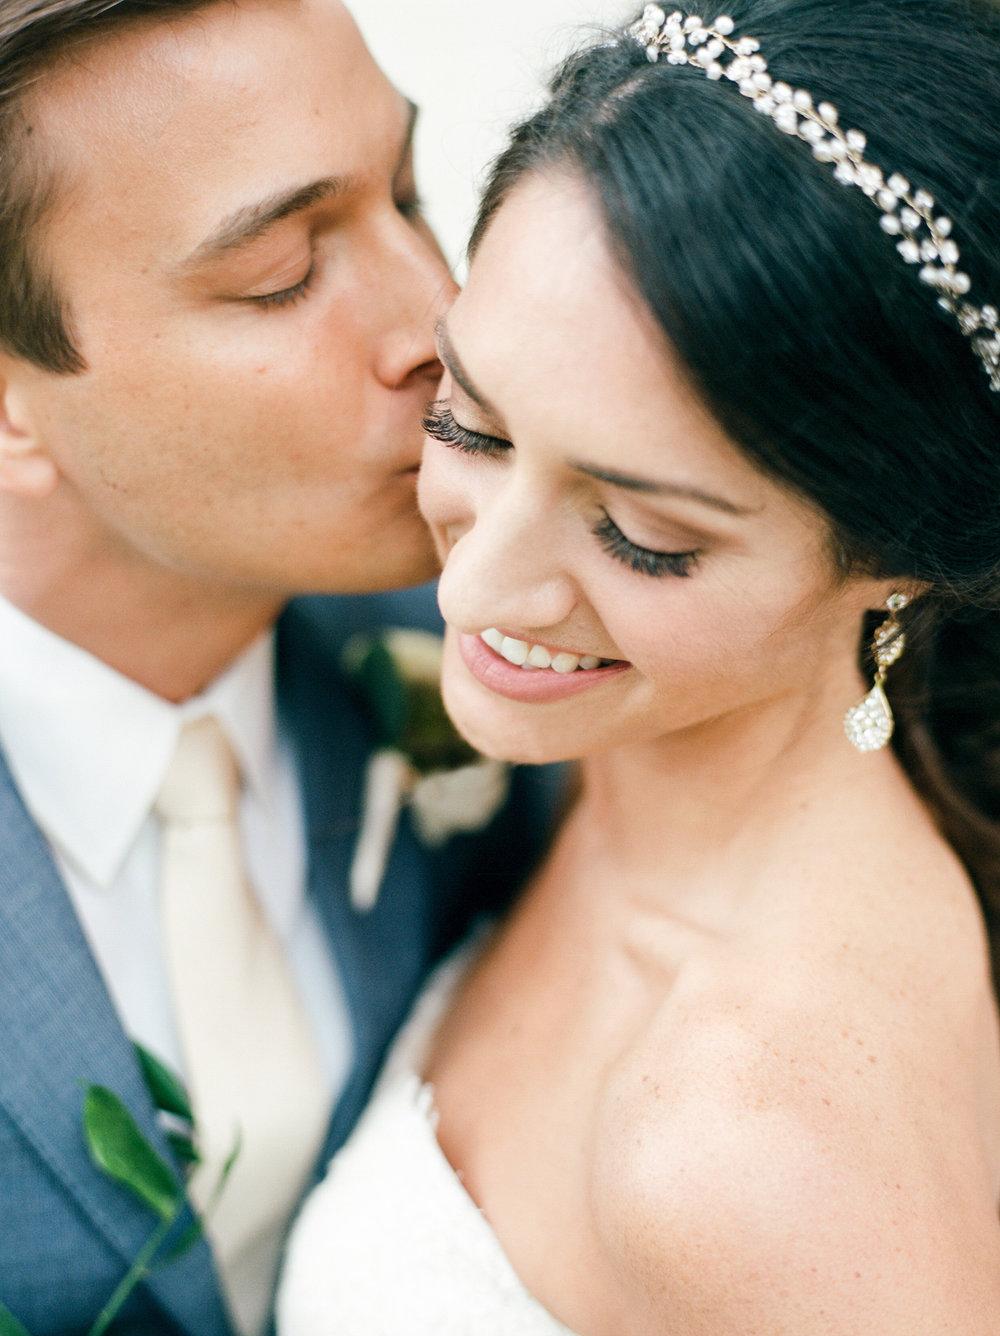 Briscoe-Manor-Houston-Wedding-Photographer-Modern-Luxury-Weddings-Dana-Fernandez-Photograpy-Fine-Art-Photographer-Houston-Film-Destination-PNW-Wedding-Photographer-10.jpg